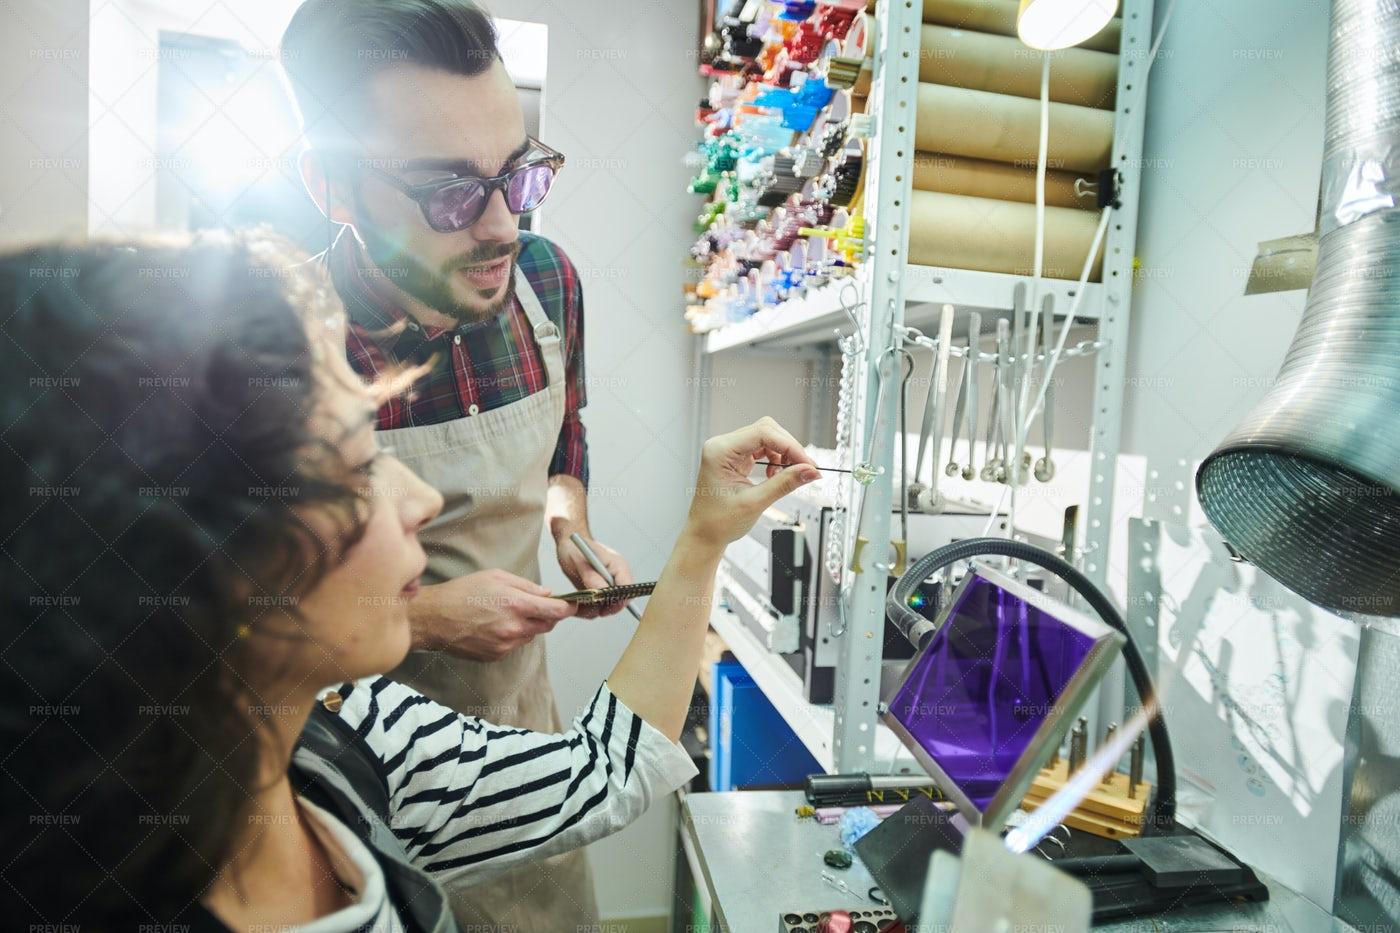 Crafters Glassworking In Studio: Stock Photos